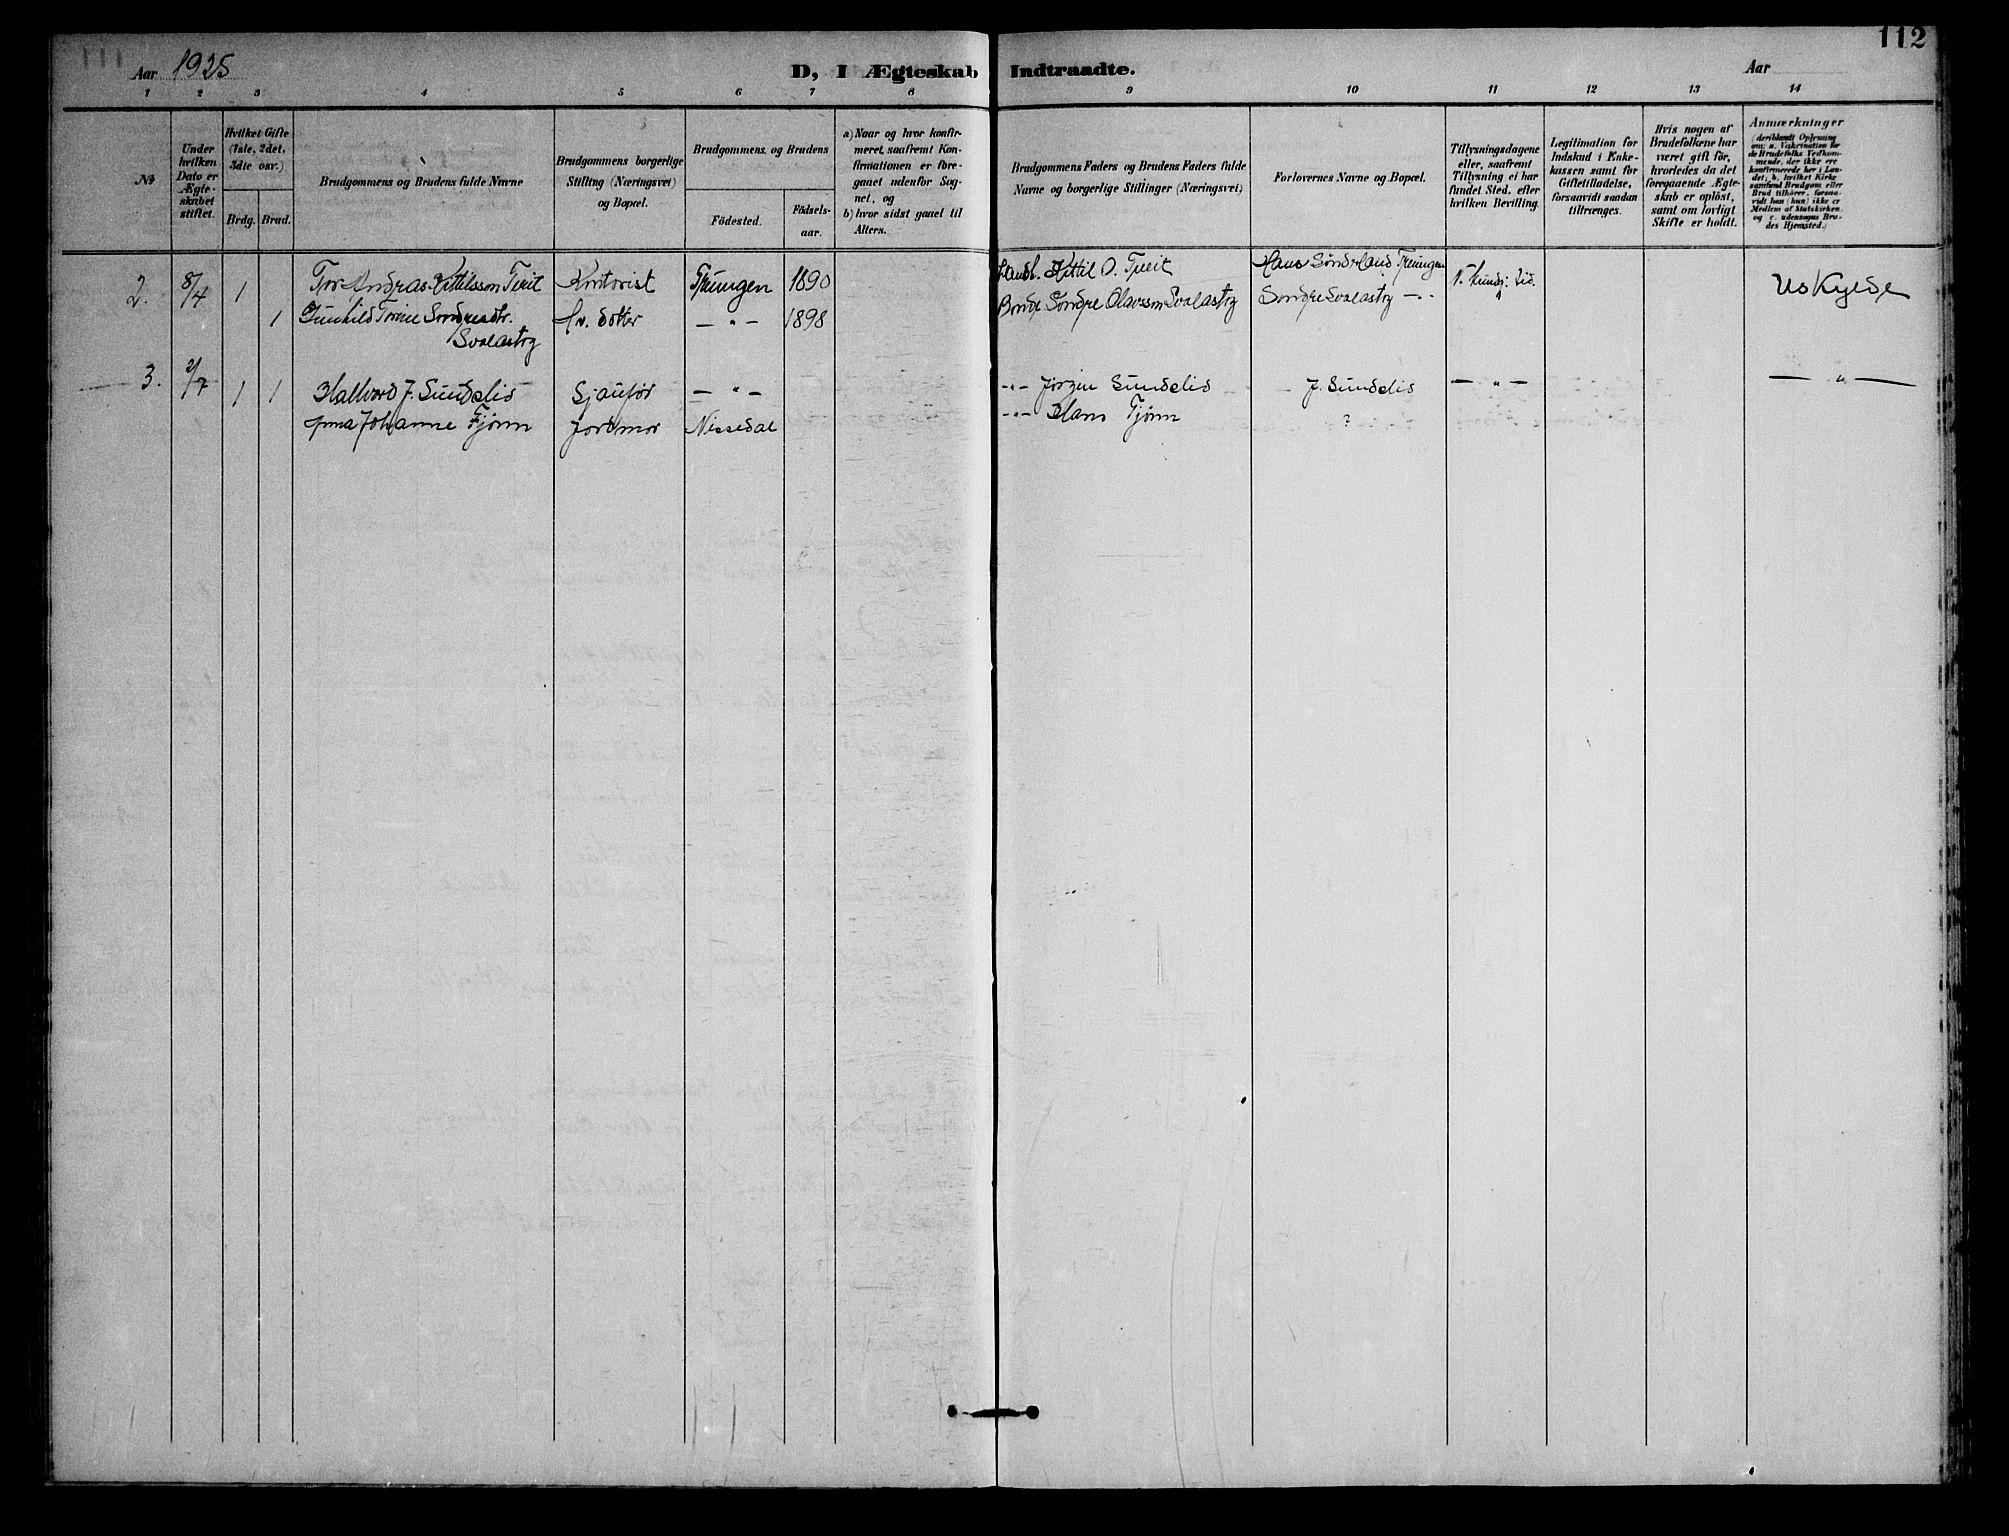 SAKO, Nissedal kirkebøker, G/Gb/L0003: Klokkerbok nr. II 3, 1893-1928, s. 112